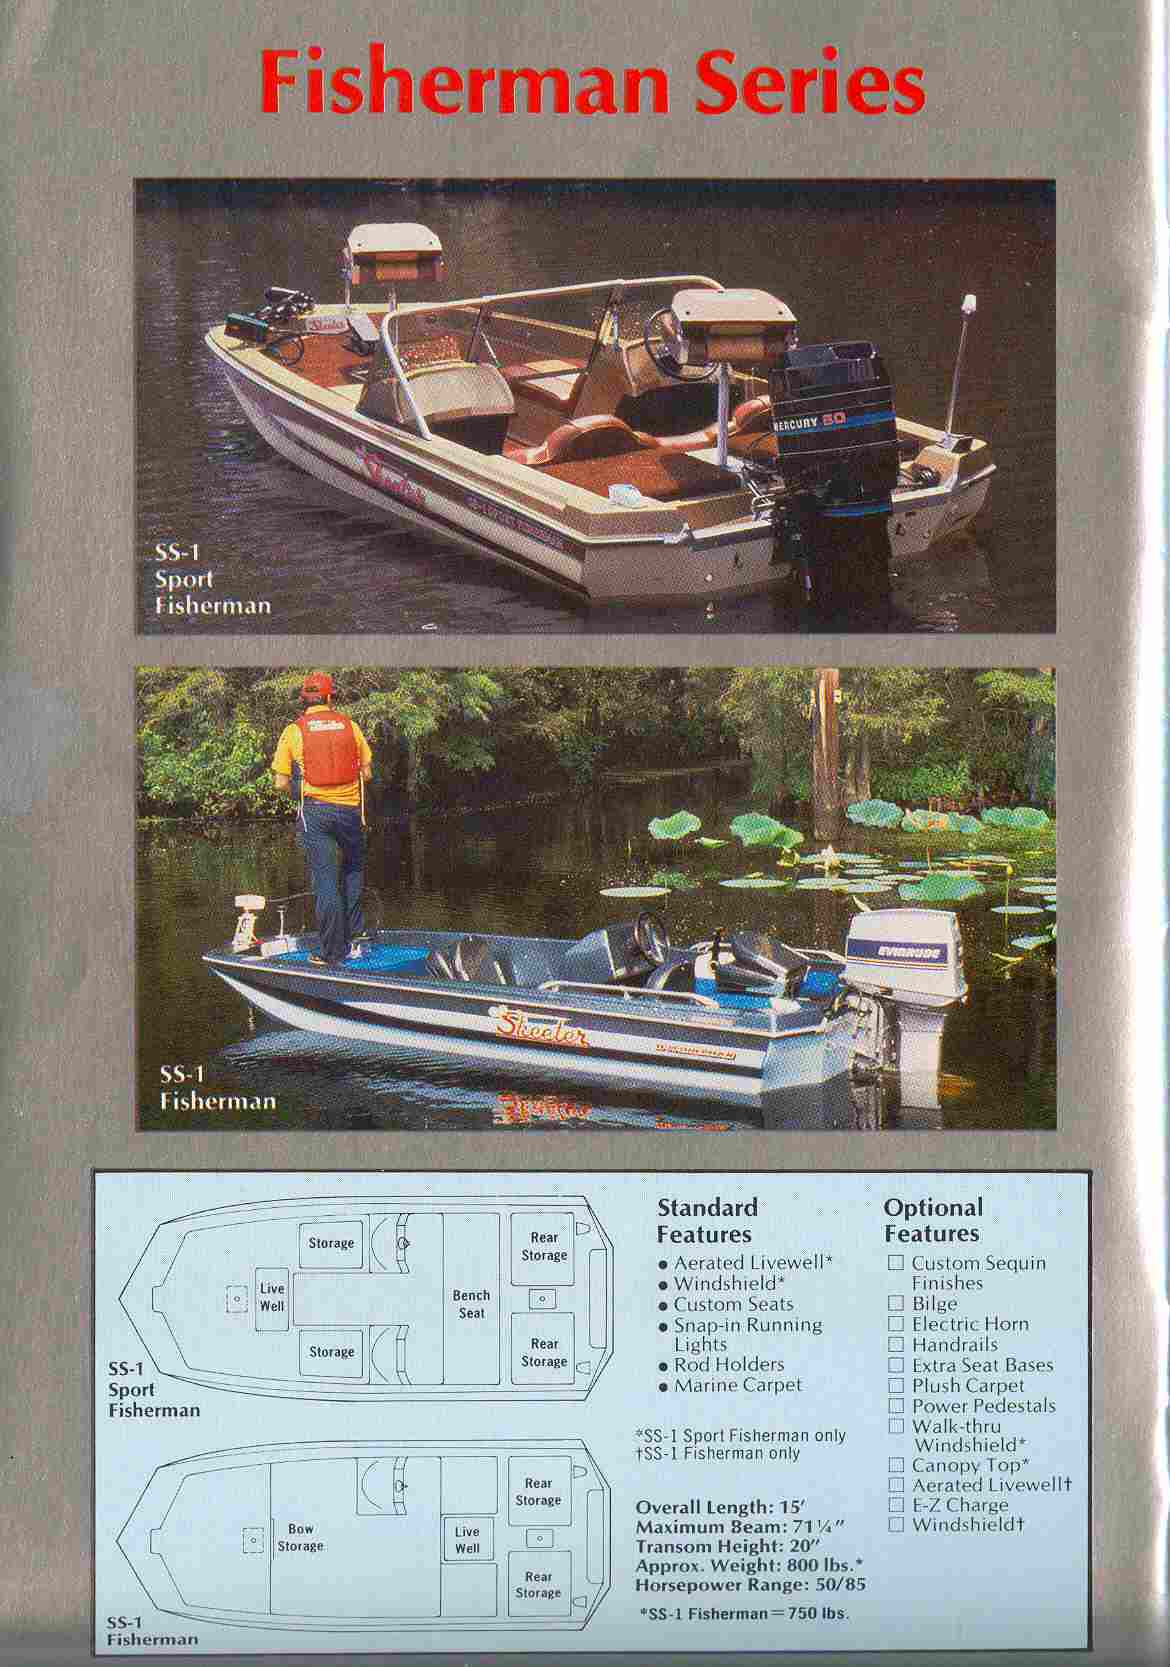 Skeeter Boat Wiring Harness : Skeeter wiring harness colors e fuse box diagram radio